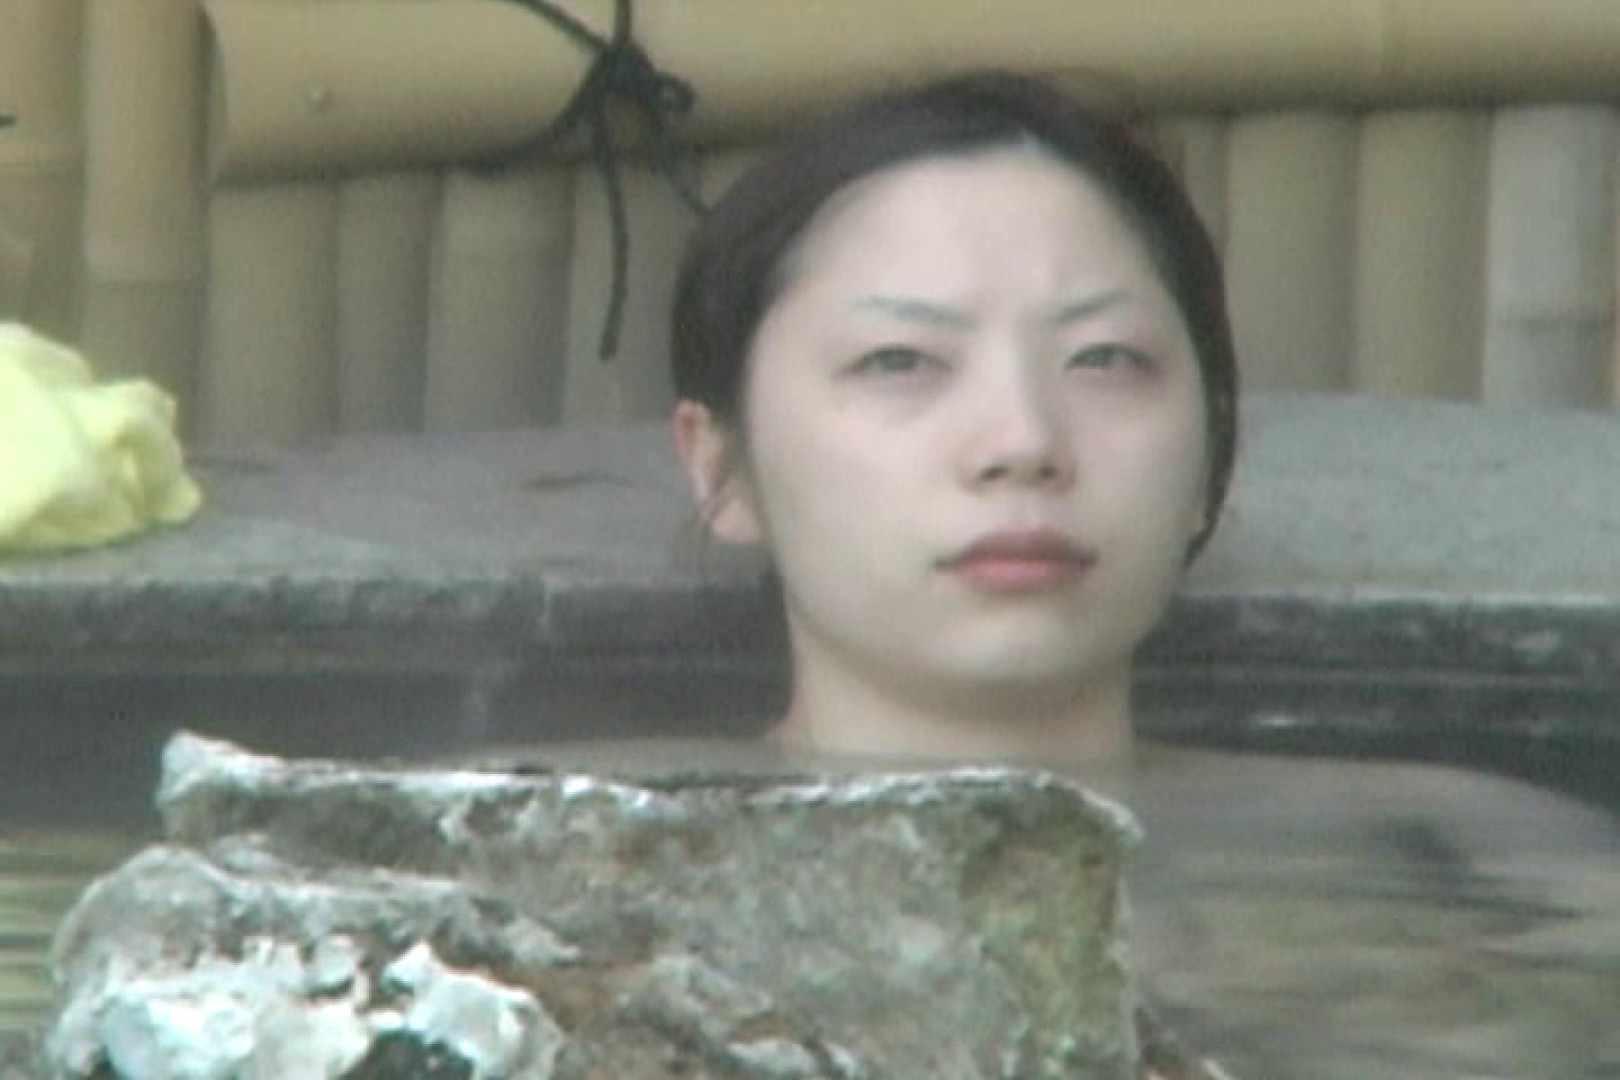 Aquaな露天風呂Vol.596 露天 覗きおまんこ画像 77画像 41